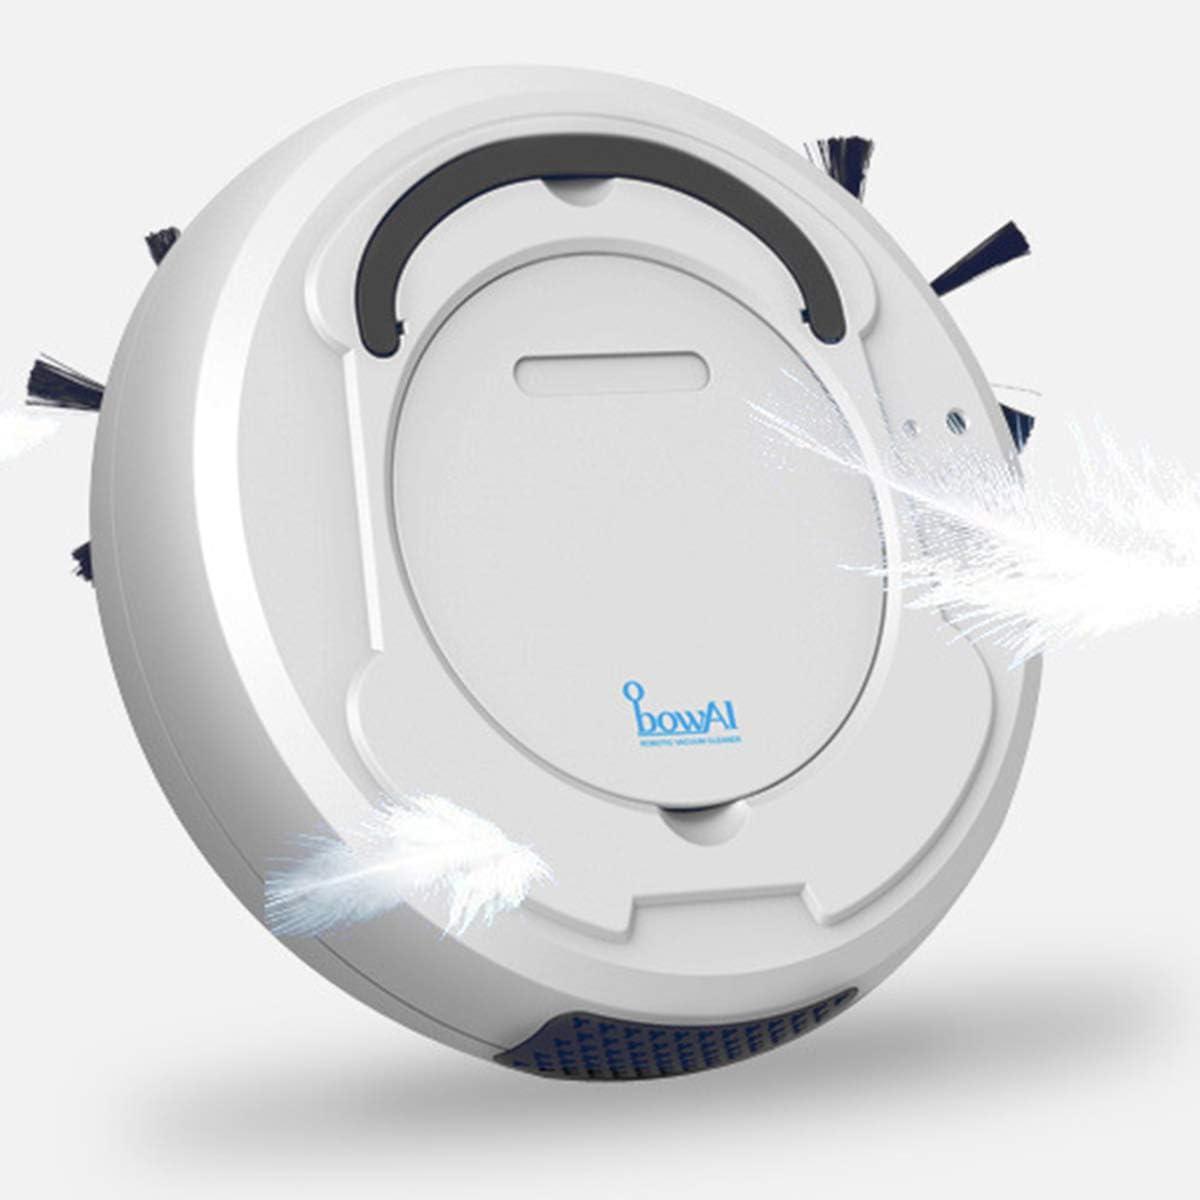 SANON Robot 高品質 Vacuum Cleaner 3-in-1 激安通販販売 Vac Dust Sweeping Mopping